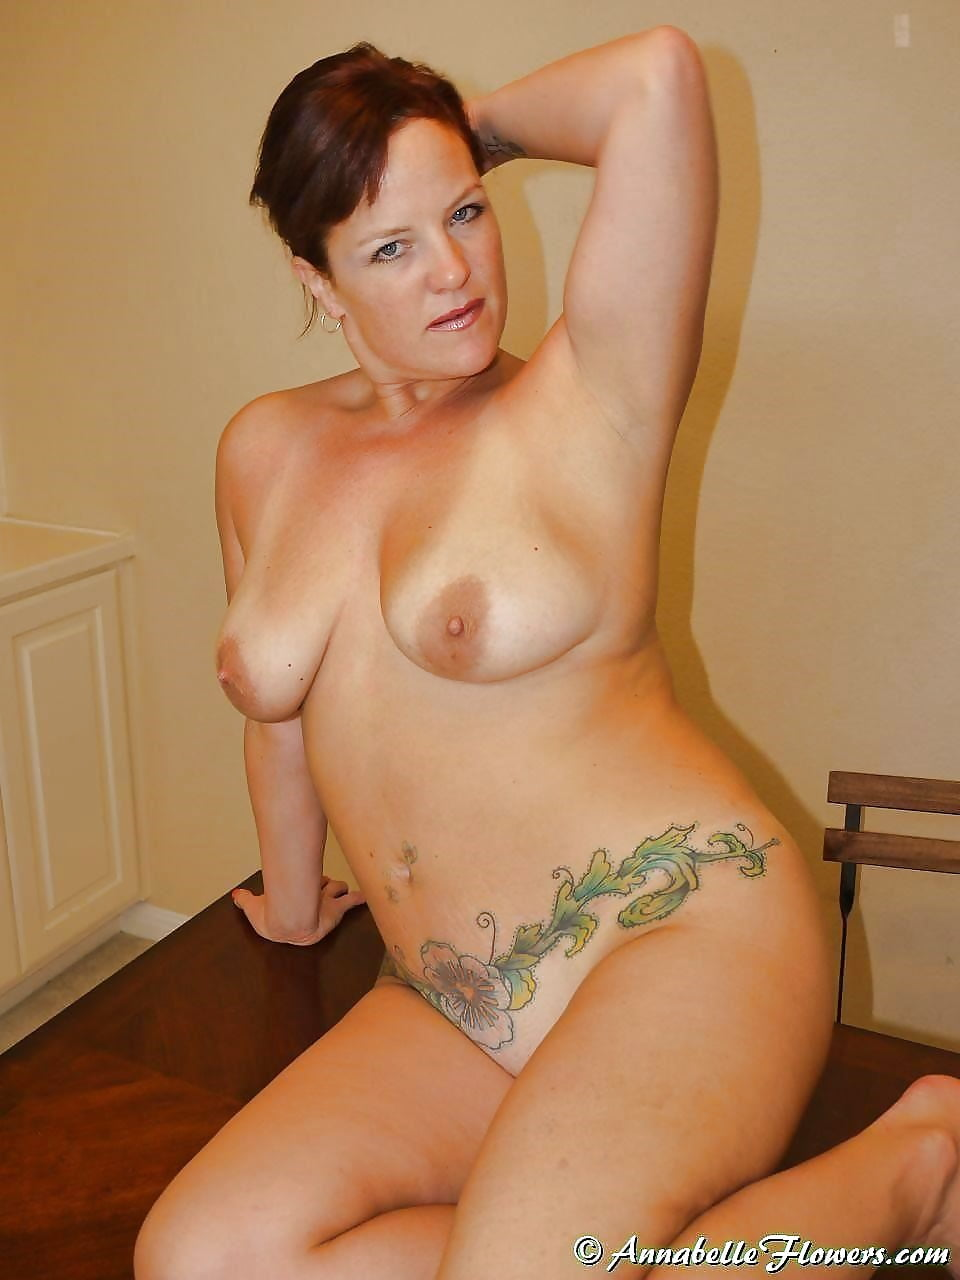 Annabelle Belmondo Nude Sexy